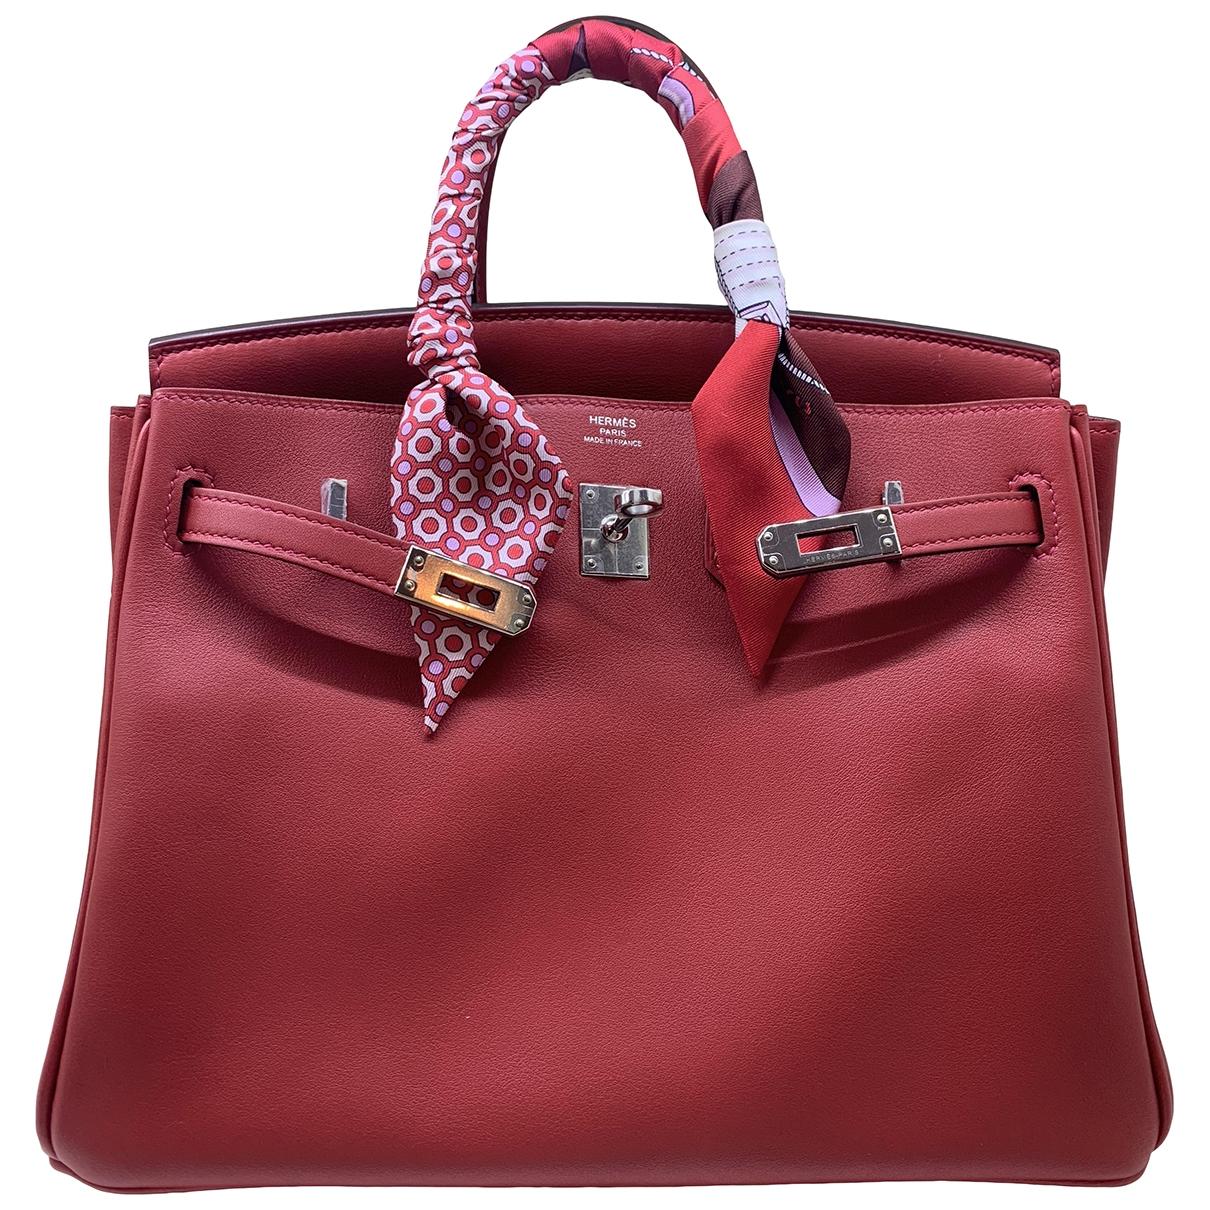 Hermes - Sac a main Birkin 25 pour femme en cuir - rouge